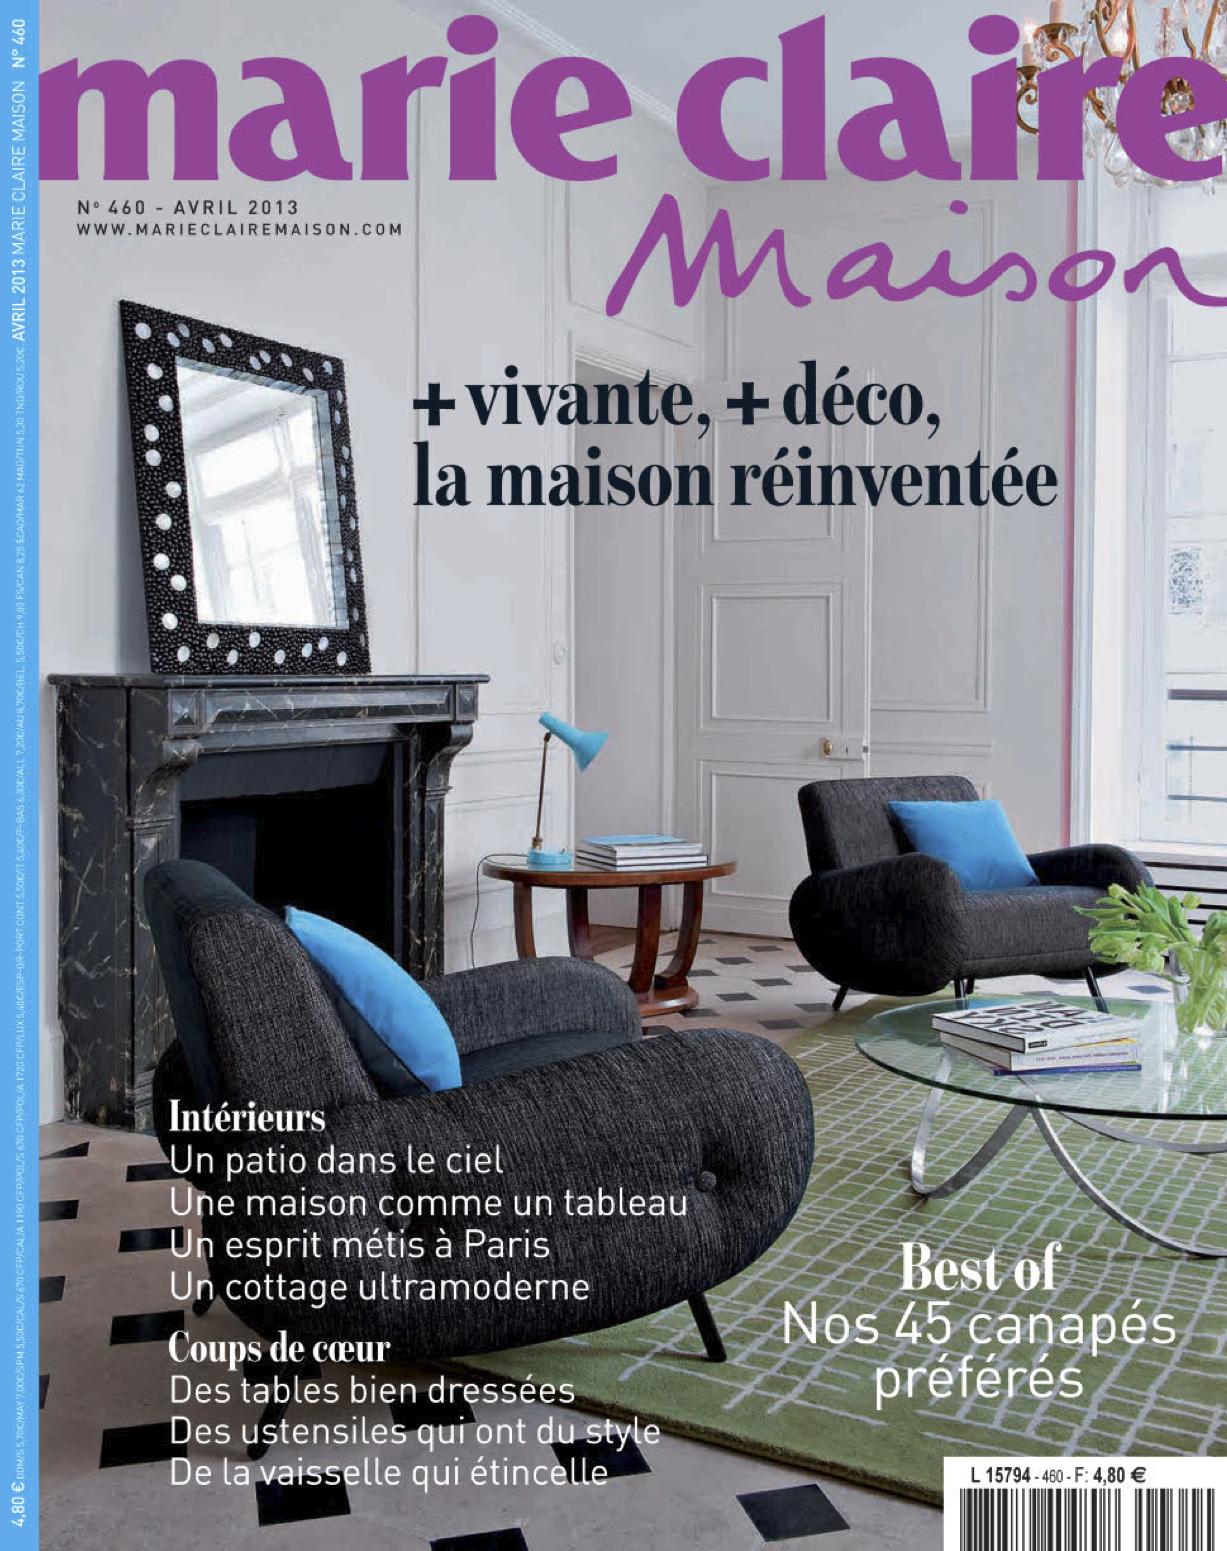 Marie_Claire_Maison_No.460_-_cover.jpg